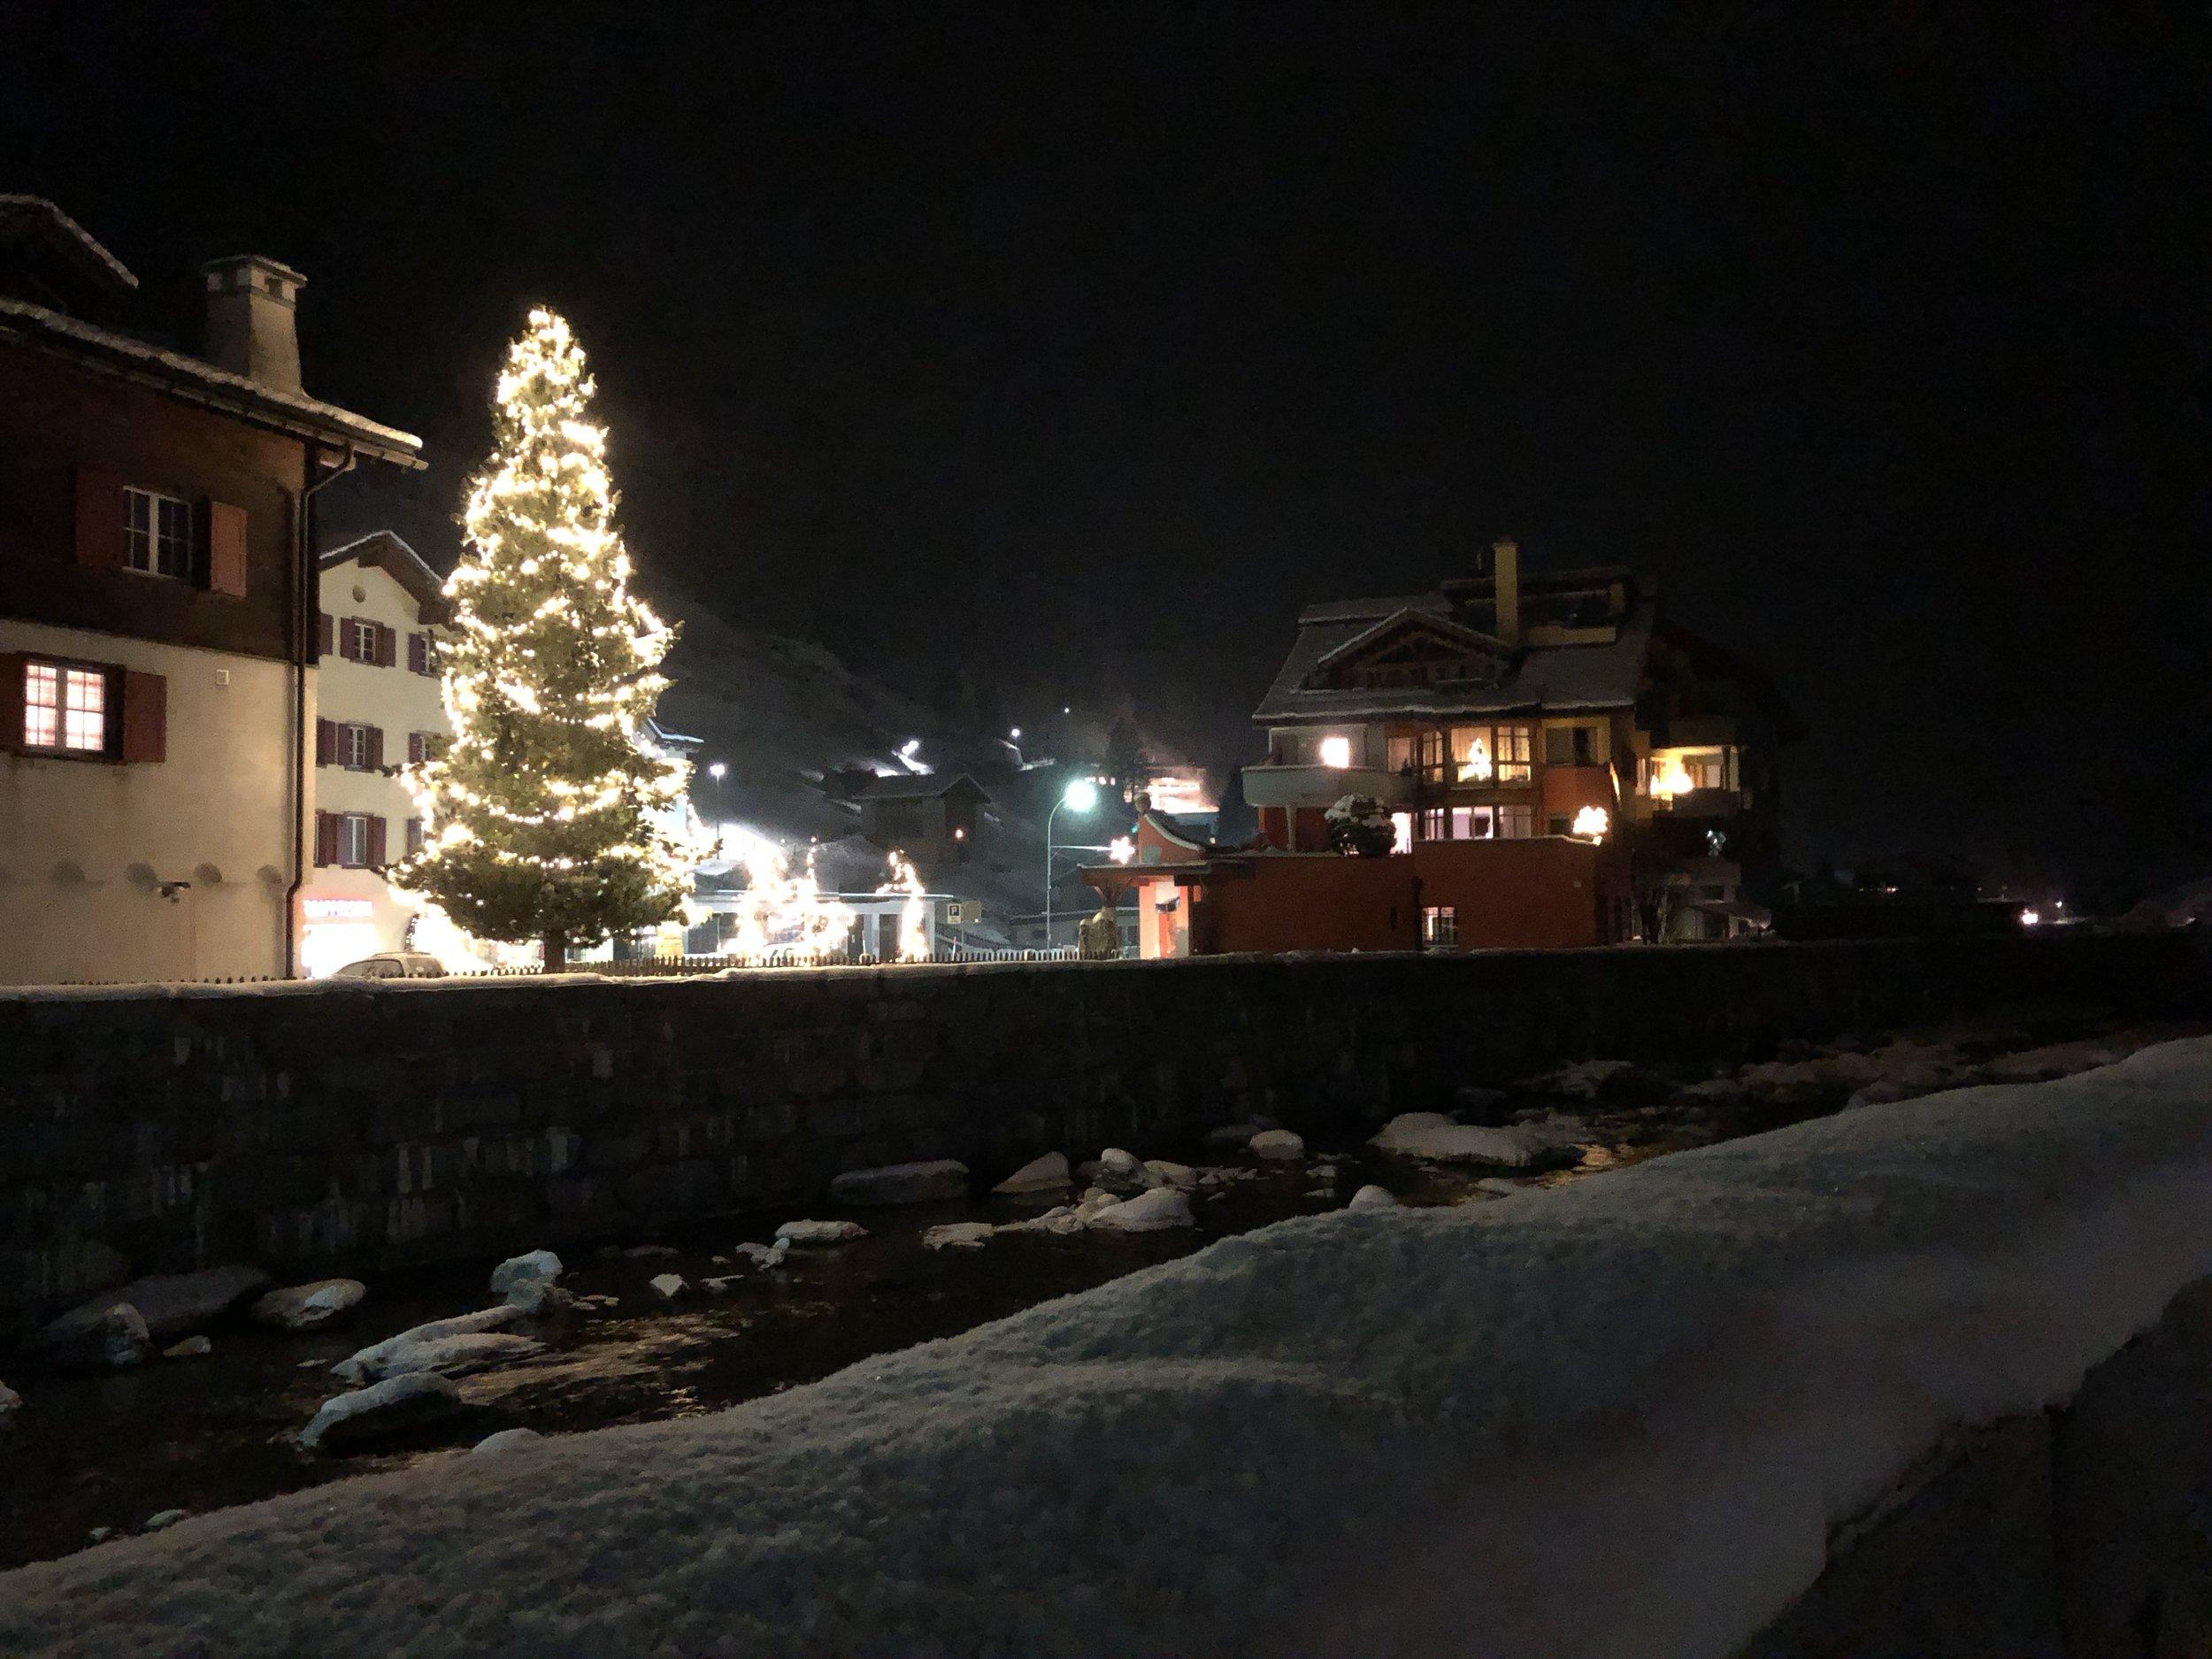 Good night in Vals